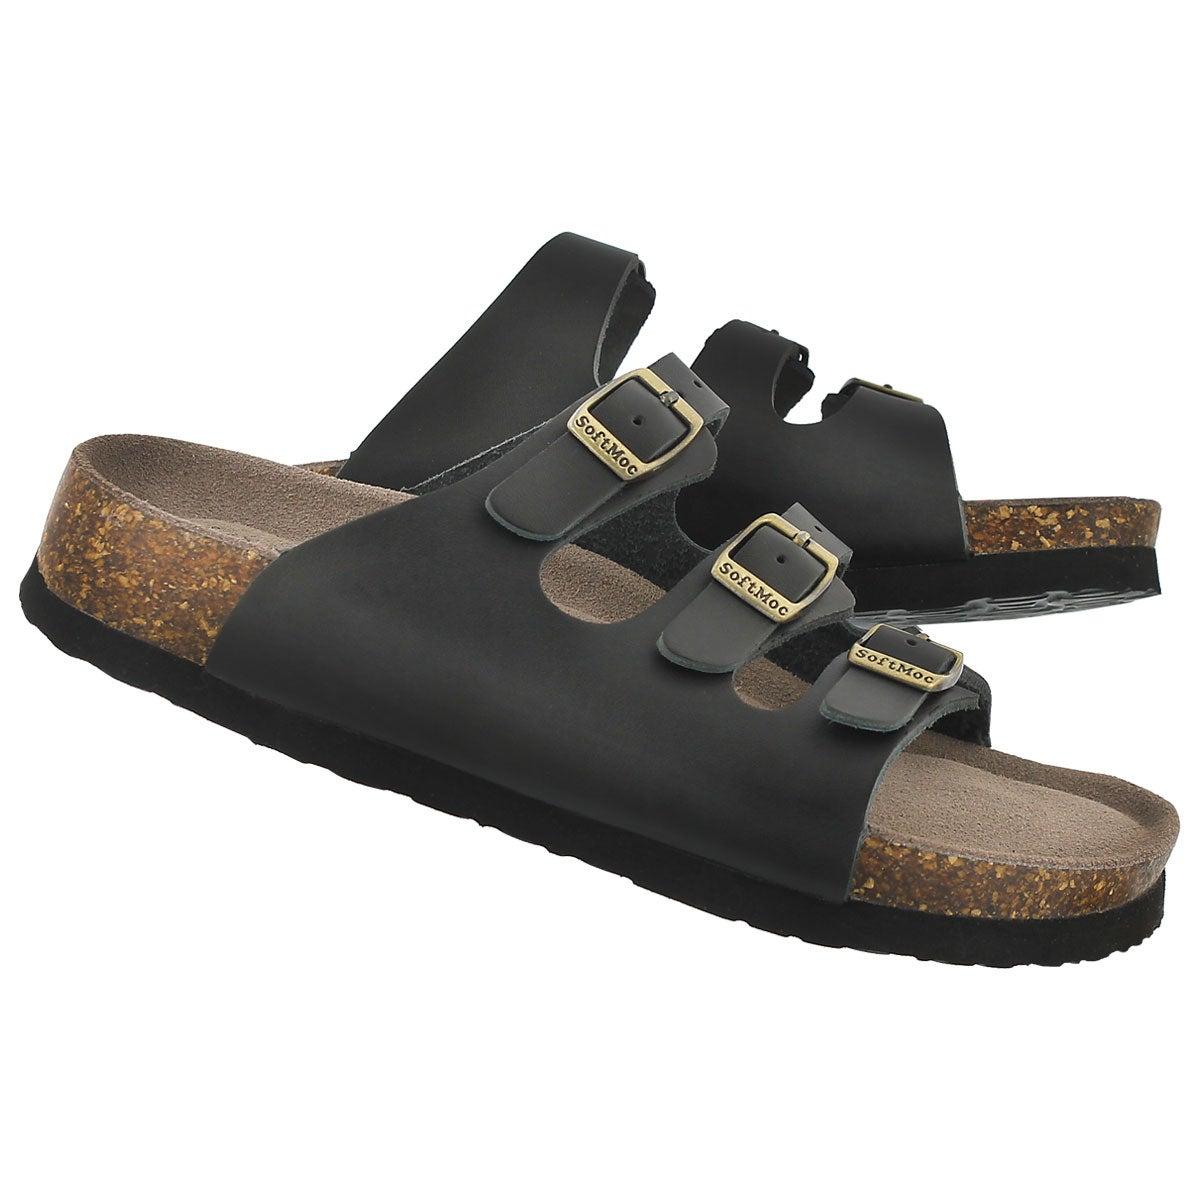 Lds Alexis 2 black memory foam sandal